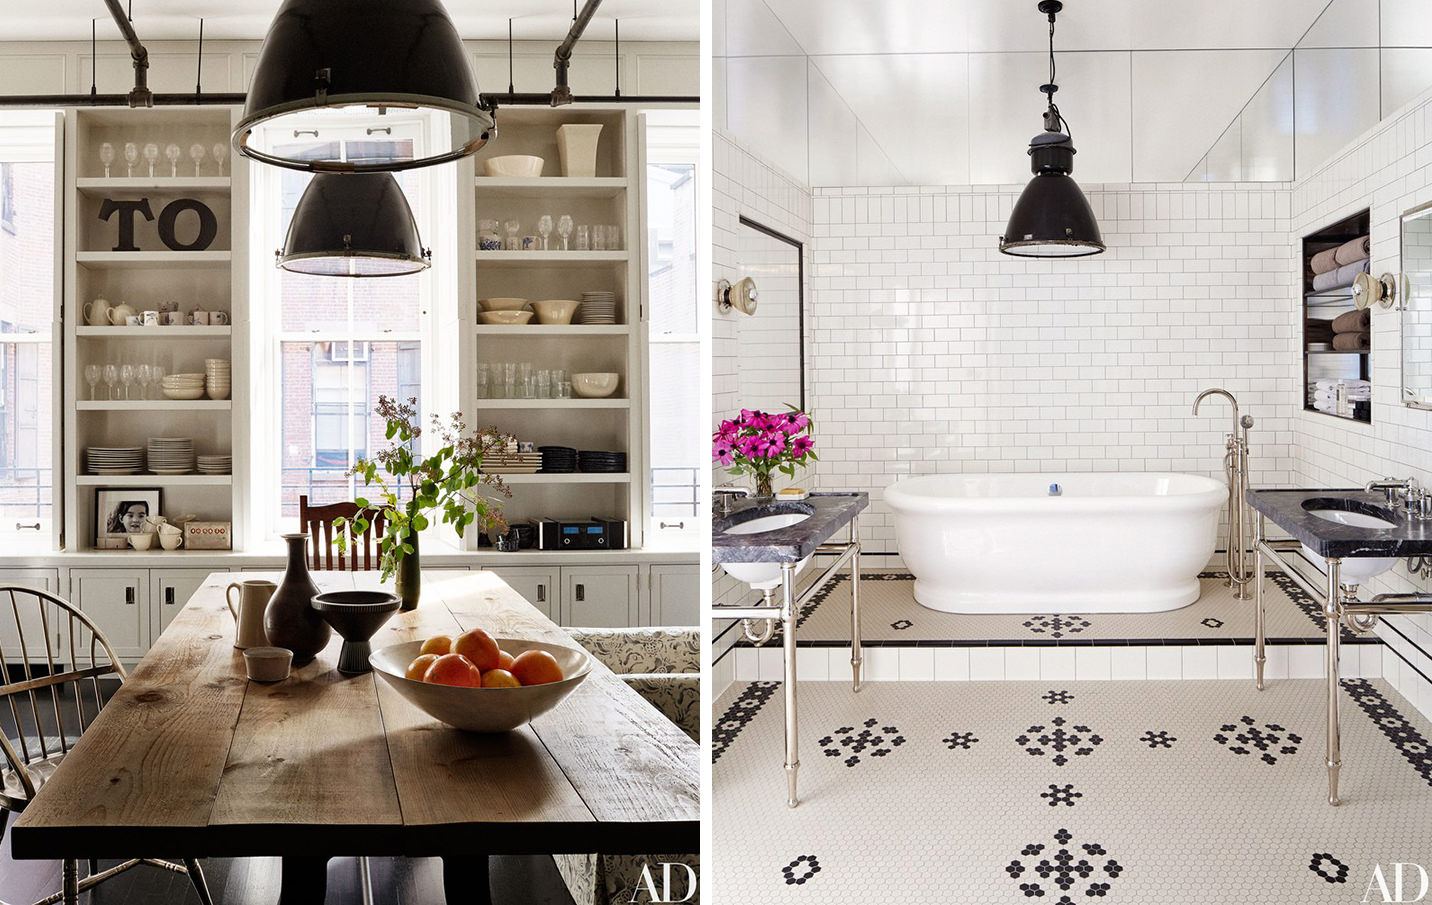 Blog-Mode-And-The-City-Lifestyle-Cinq-Petites-Choses-193-meg-ryan-appartement-AD1